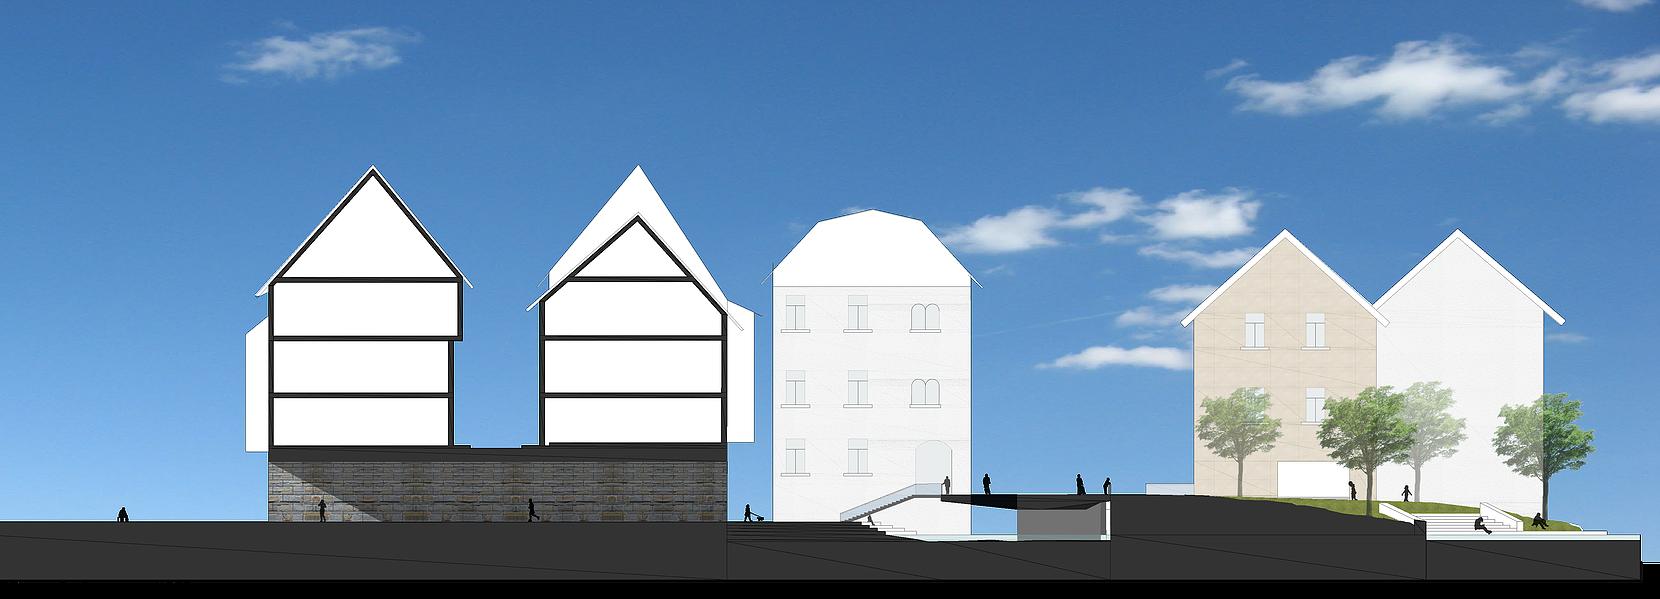 Architektur Erfurt robertogherardi project erfurt urbanredevelopment kramerbrucke